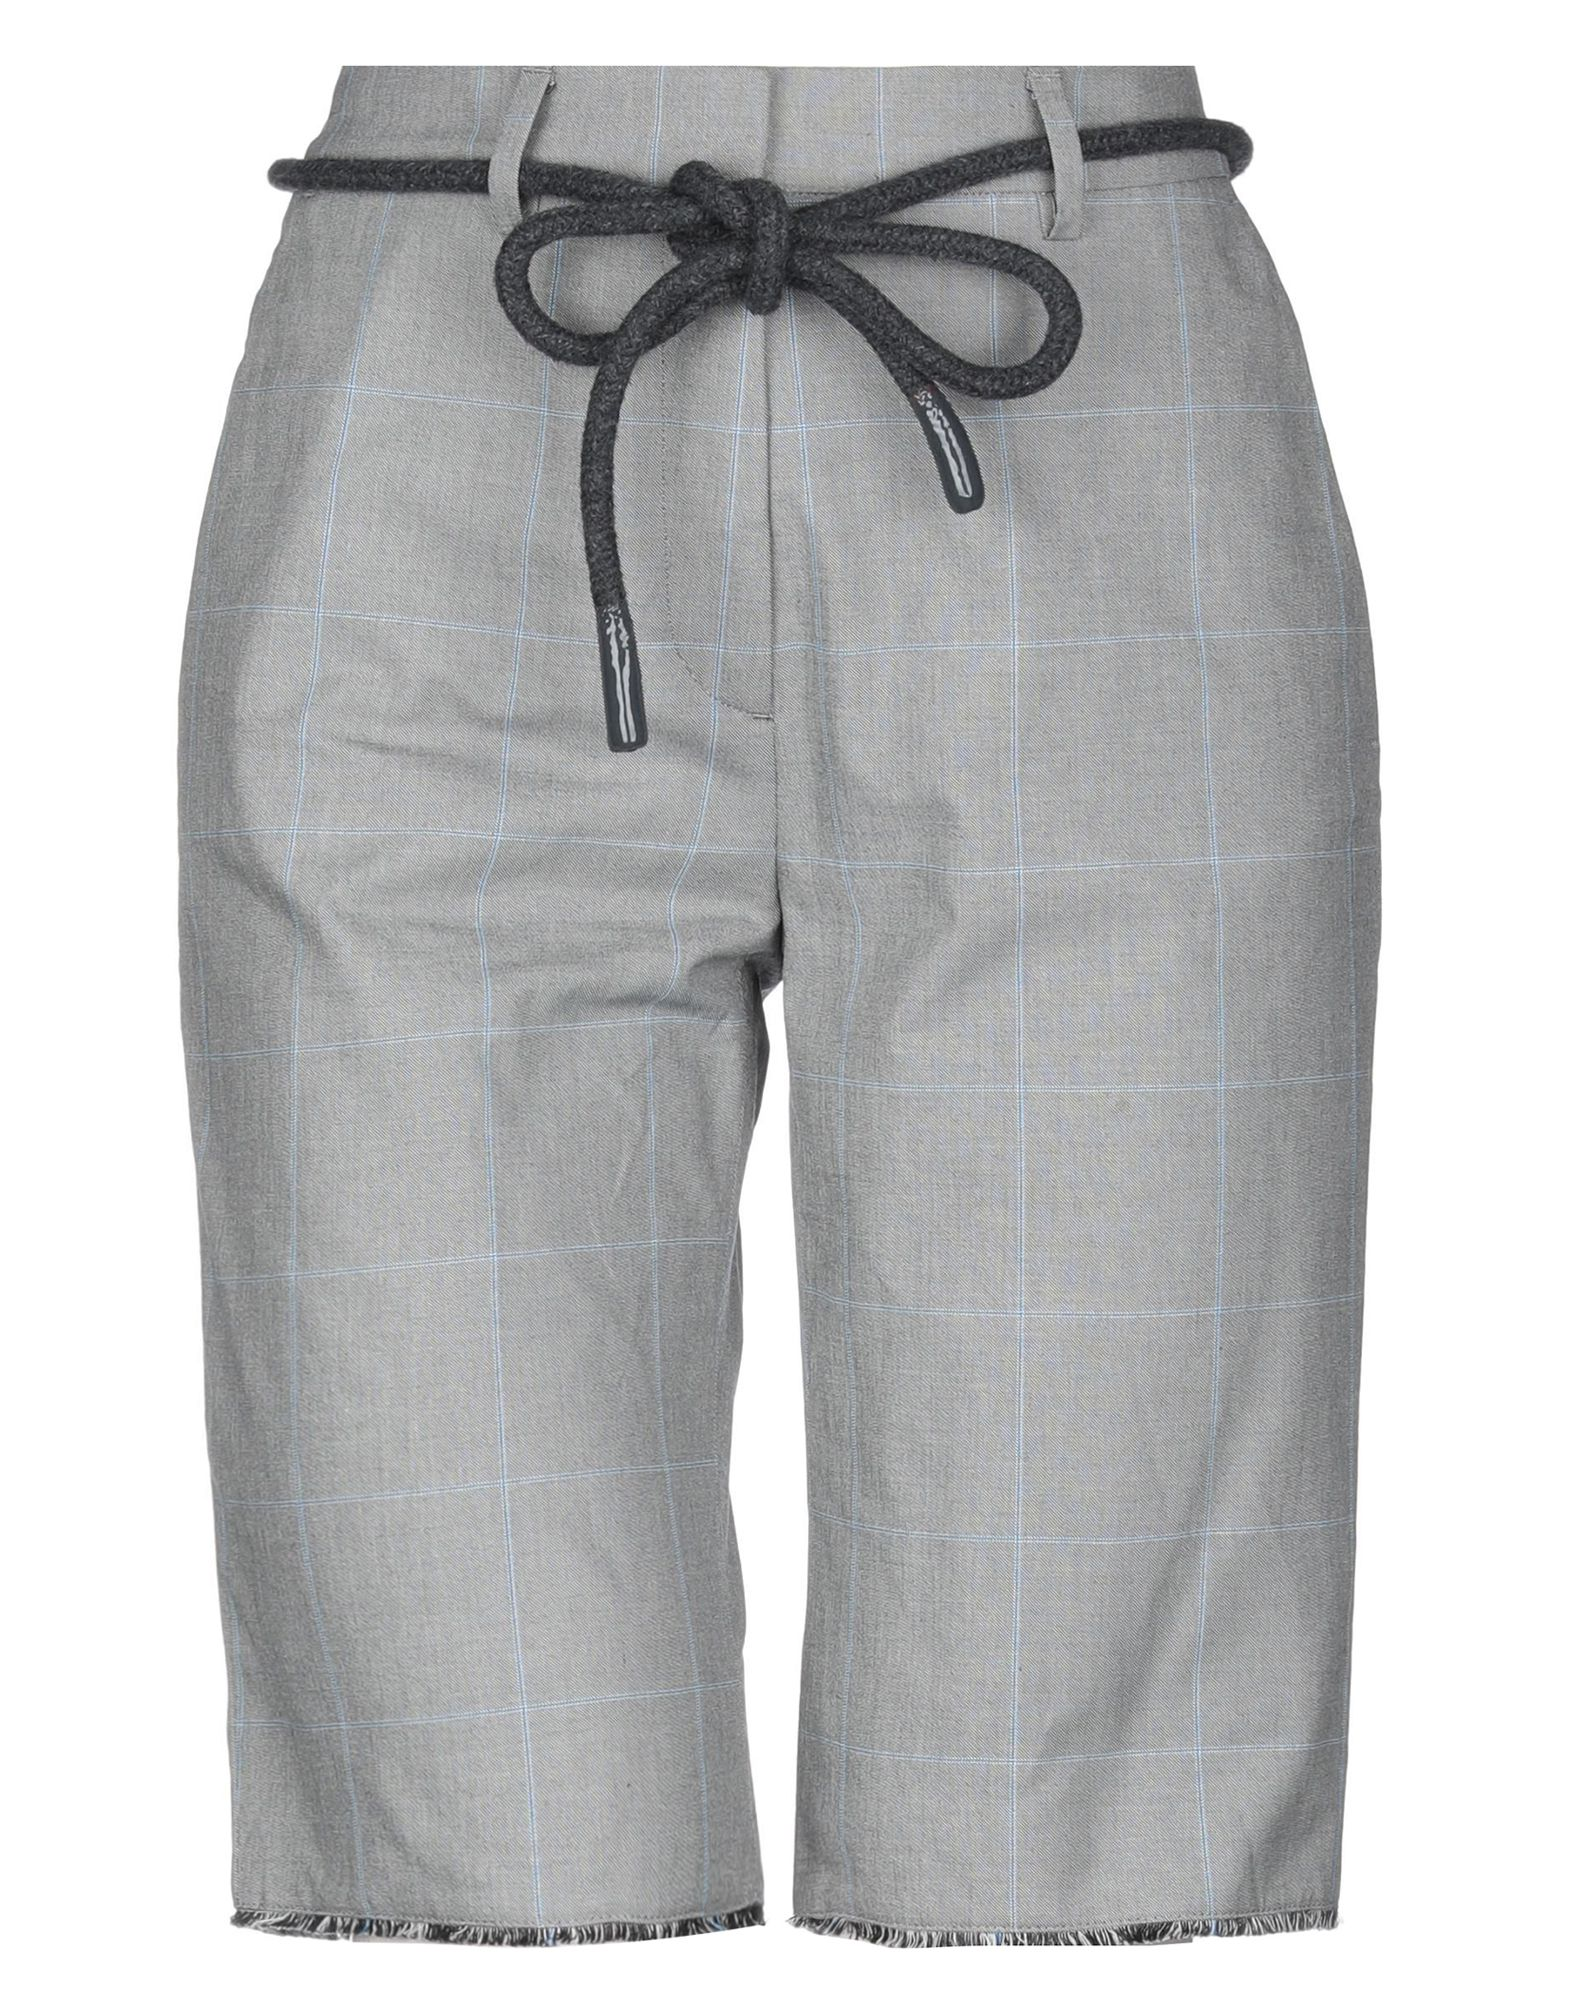 Pantalone Classico Off-Weiß™ damen - 13354338UB